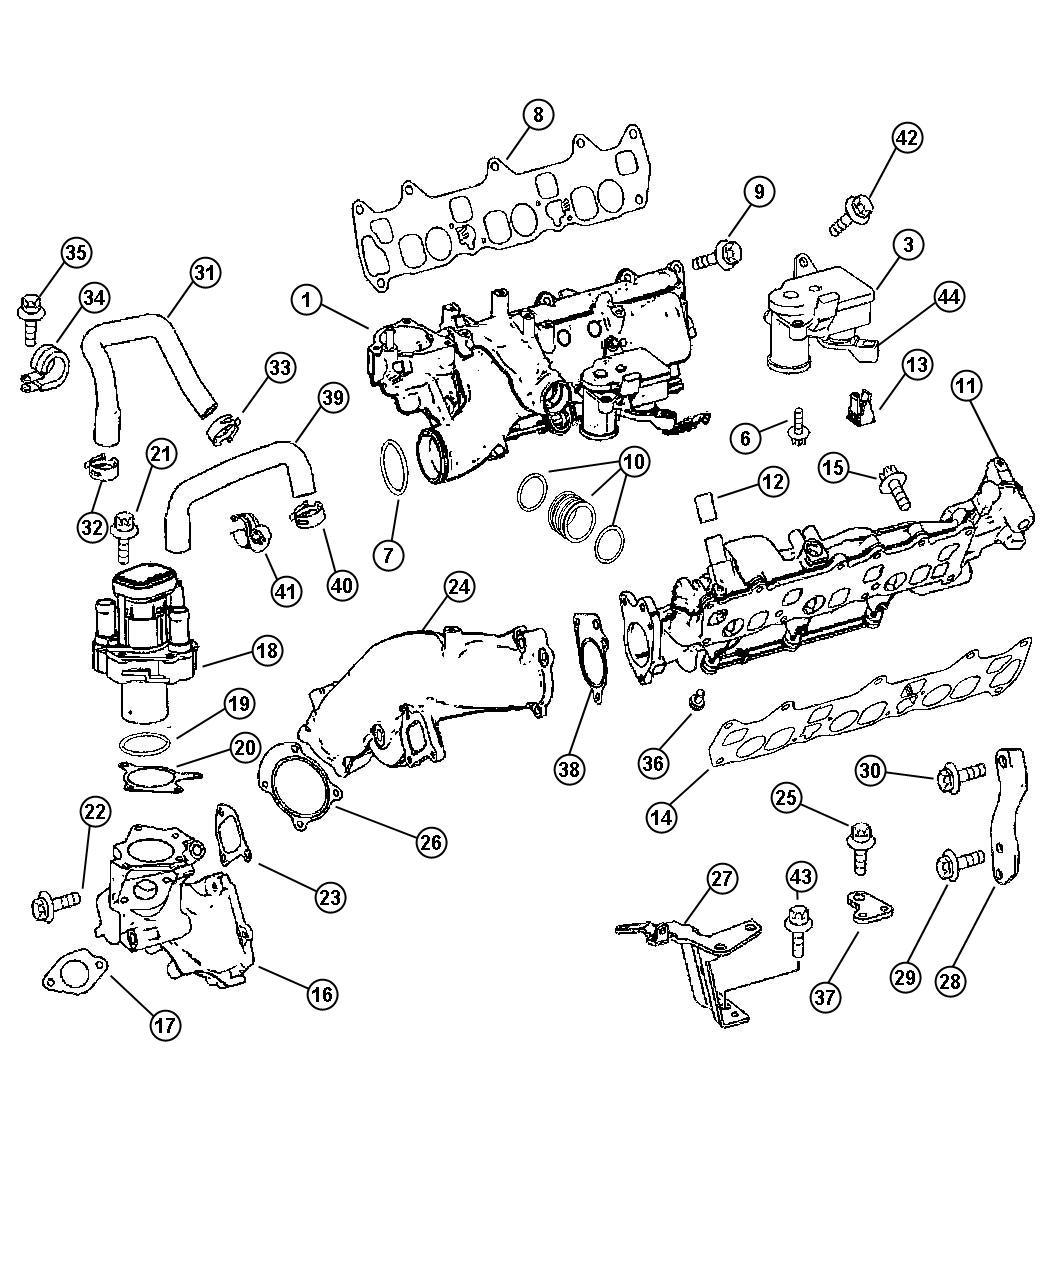 hight resolution of dodge ram van 2500 fuel filter location get free image 2007 sprinter engine diagram dodge sprinter engine diagram